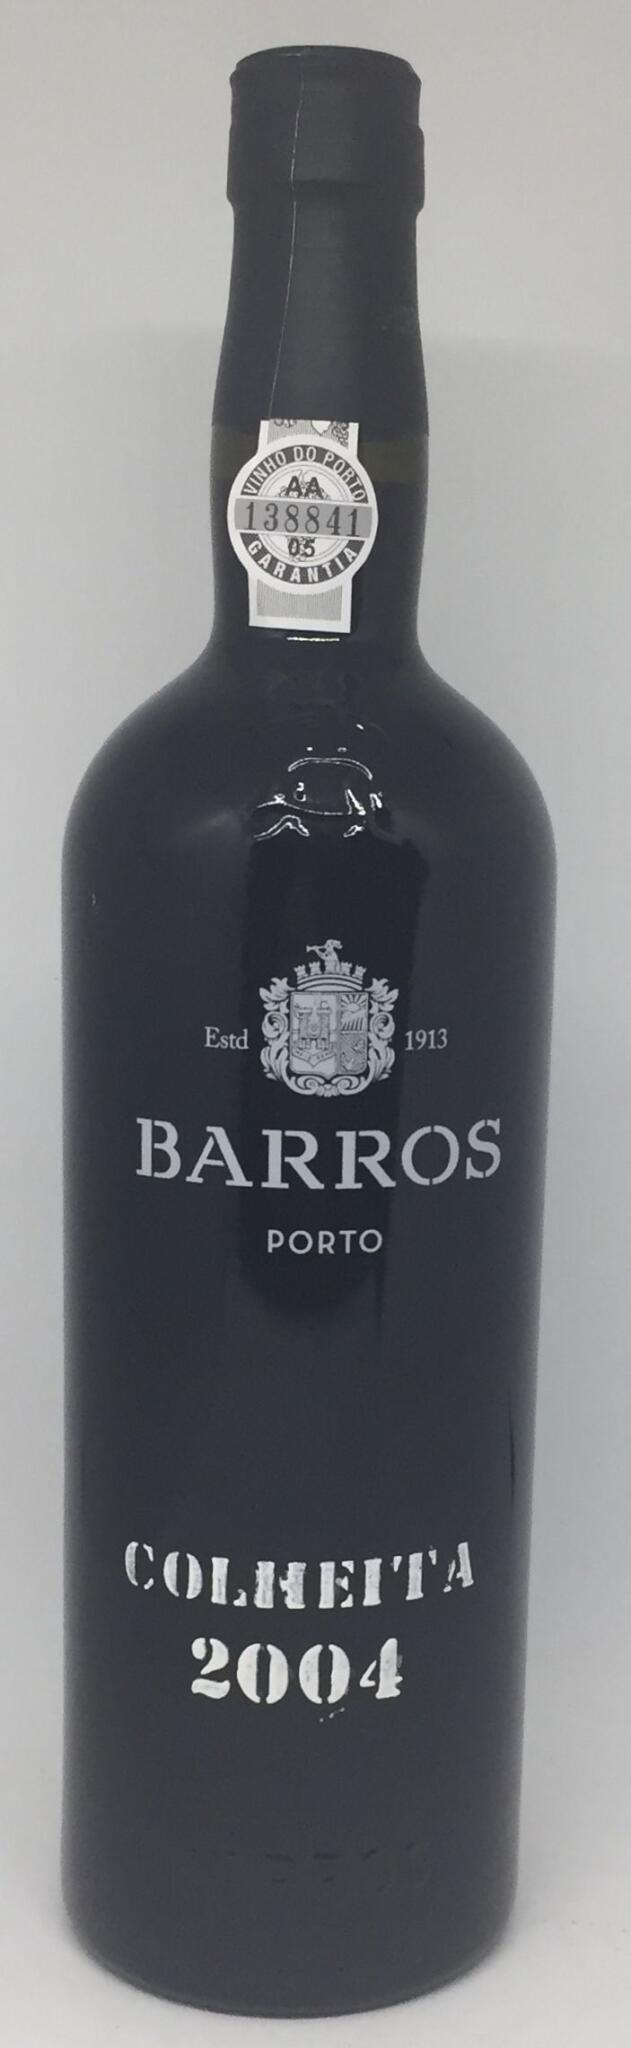 Barros 2004 Colheita flasket 2012